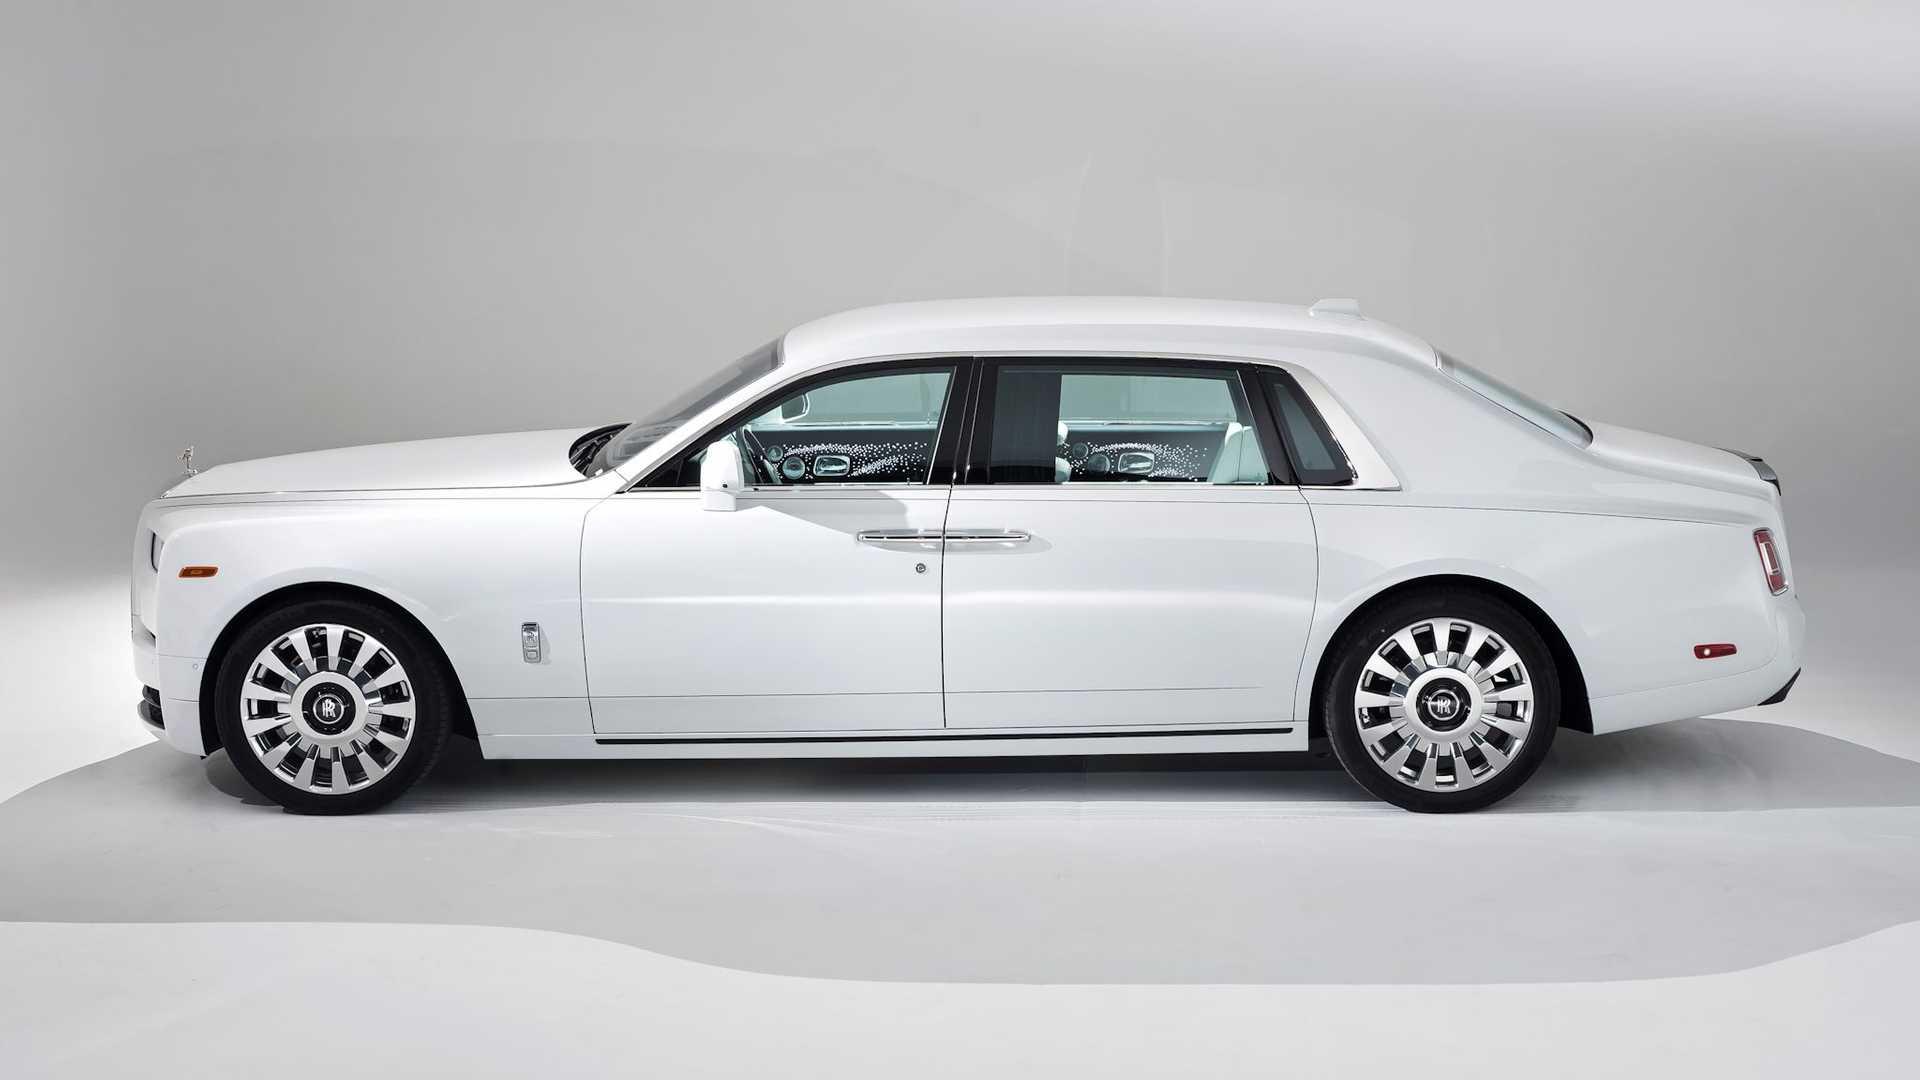 Bespoke-Rolls-Royce-Phantom-and-Dawn-8